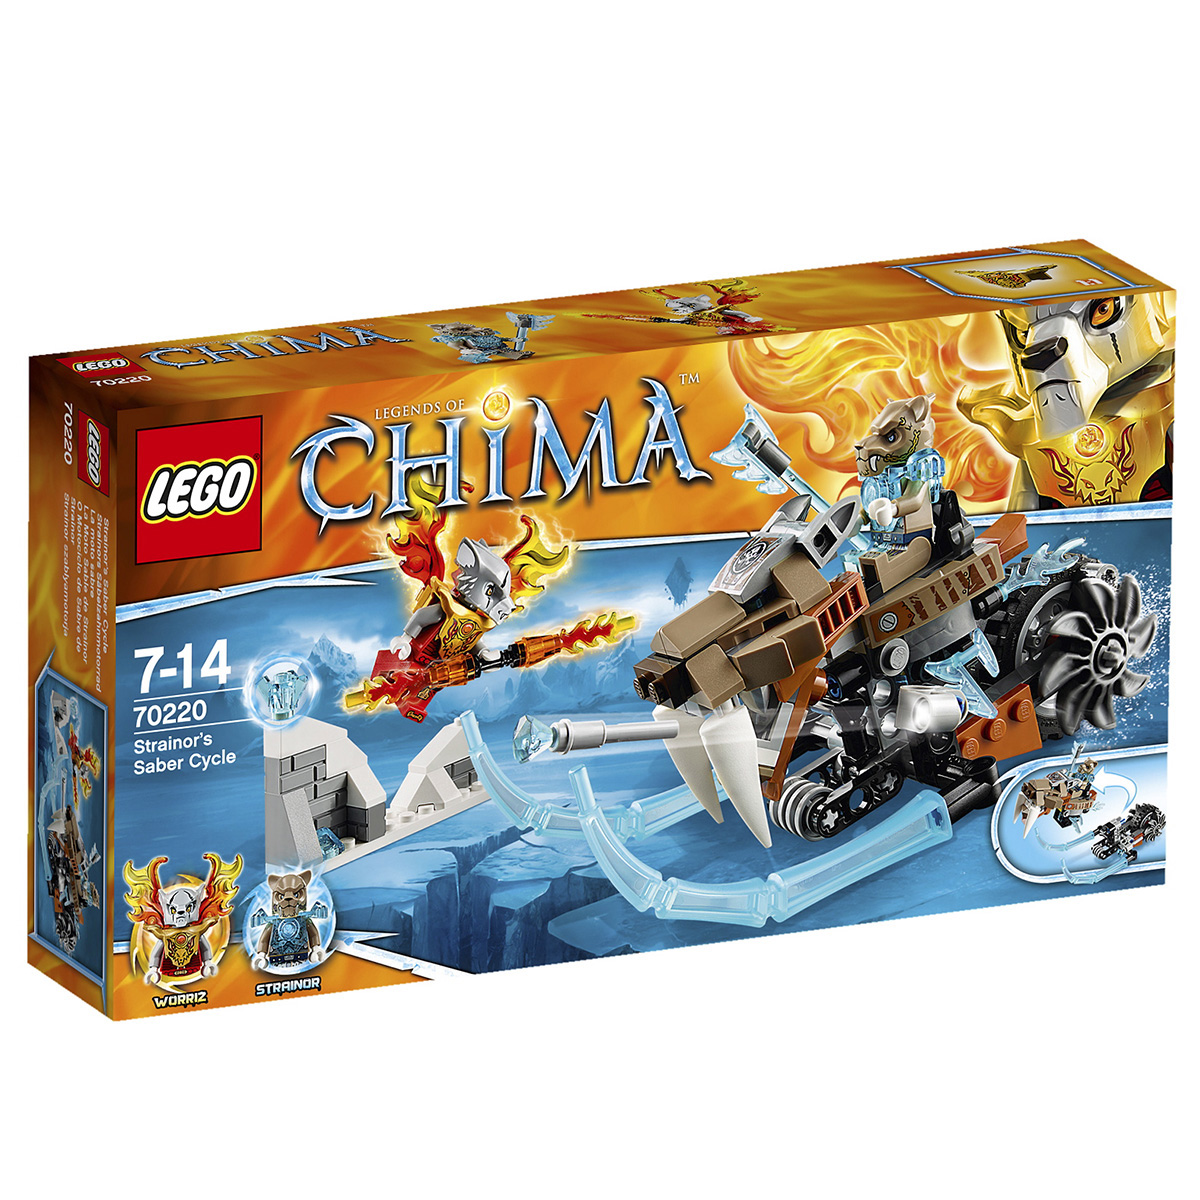 Do choi Lego 70220 – Xe nanh kiem cua Strainor